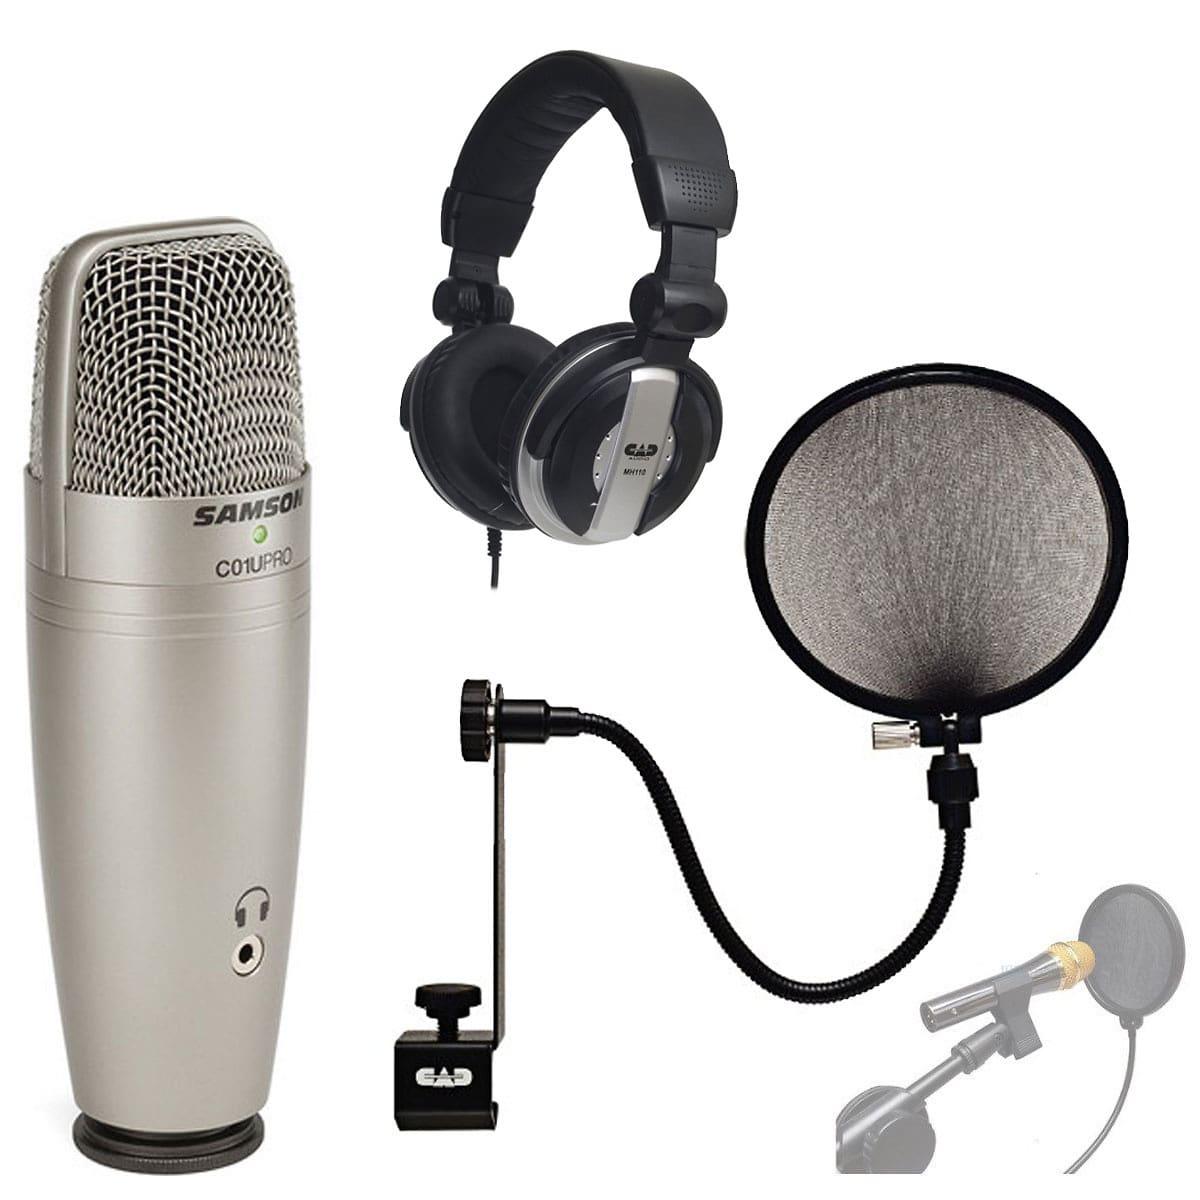 samson c01u pro usb studio condenser microphone with with reverb. Black Bedroom Furniture Sets. Home Design Ideas